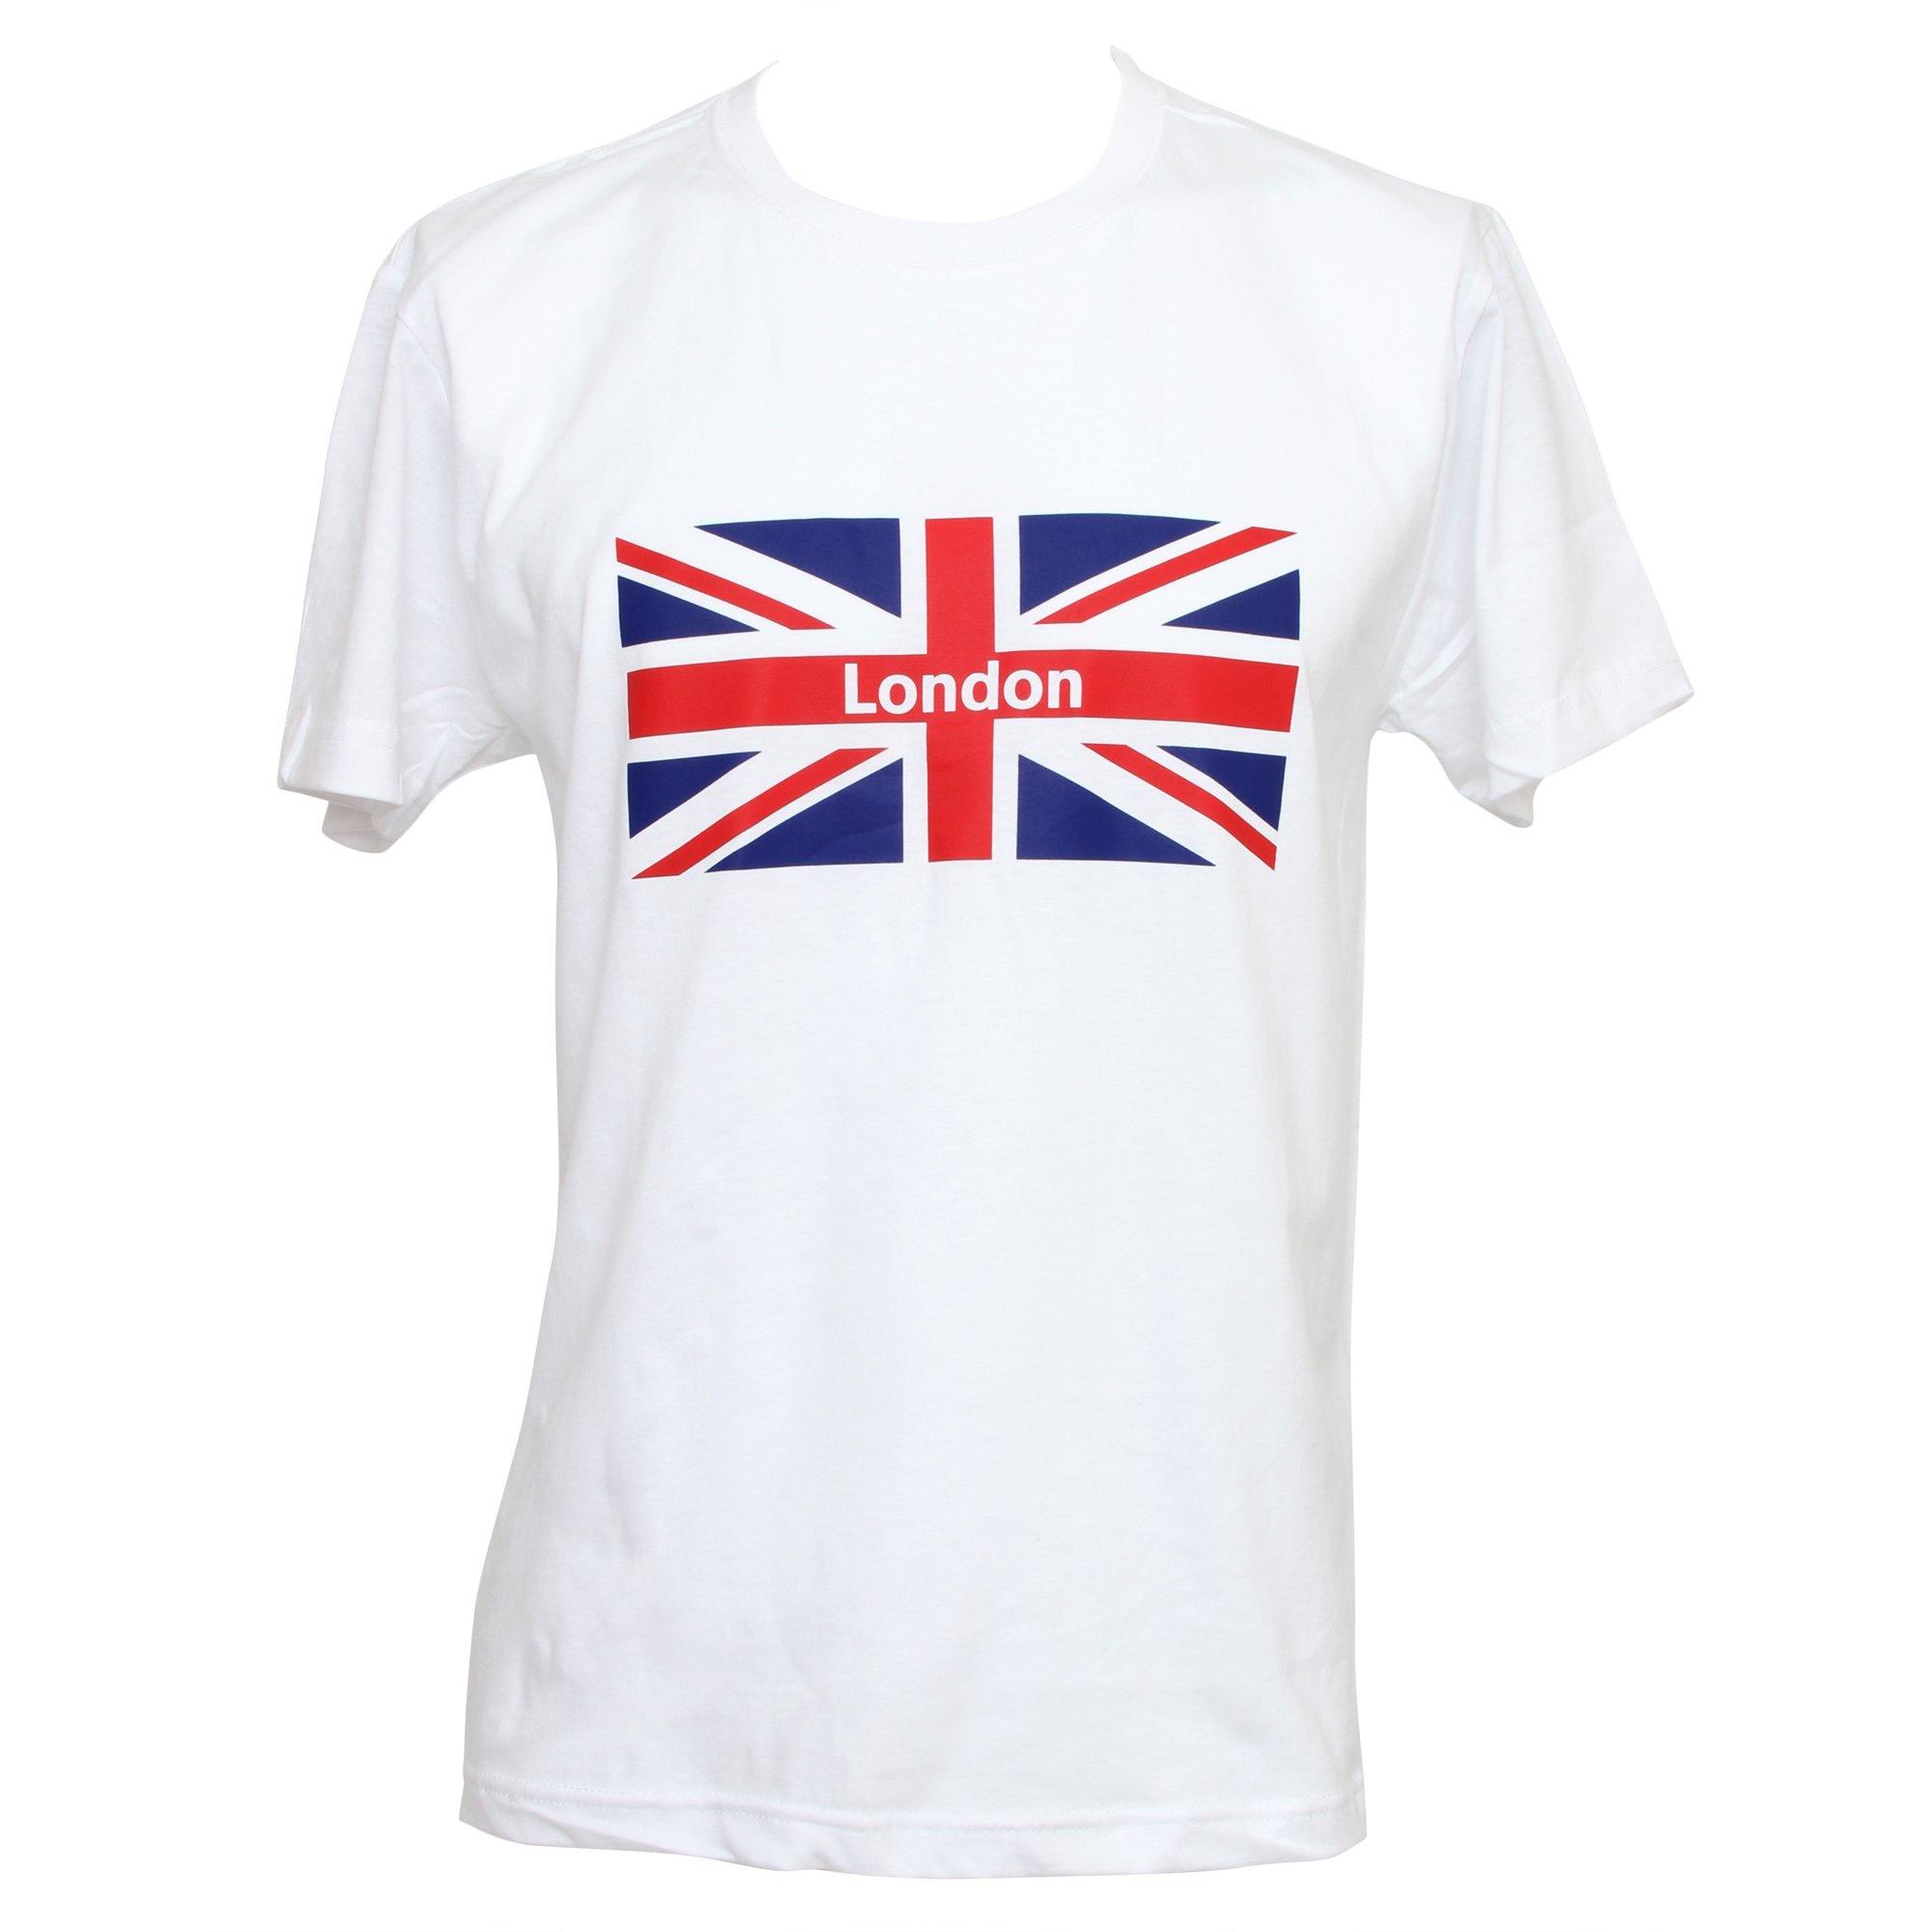 Mens London Union Jack Print Short Sleeve T Shirt Top Ebay